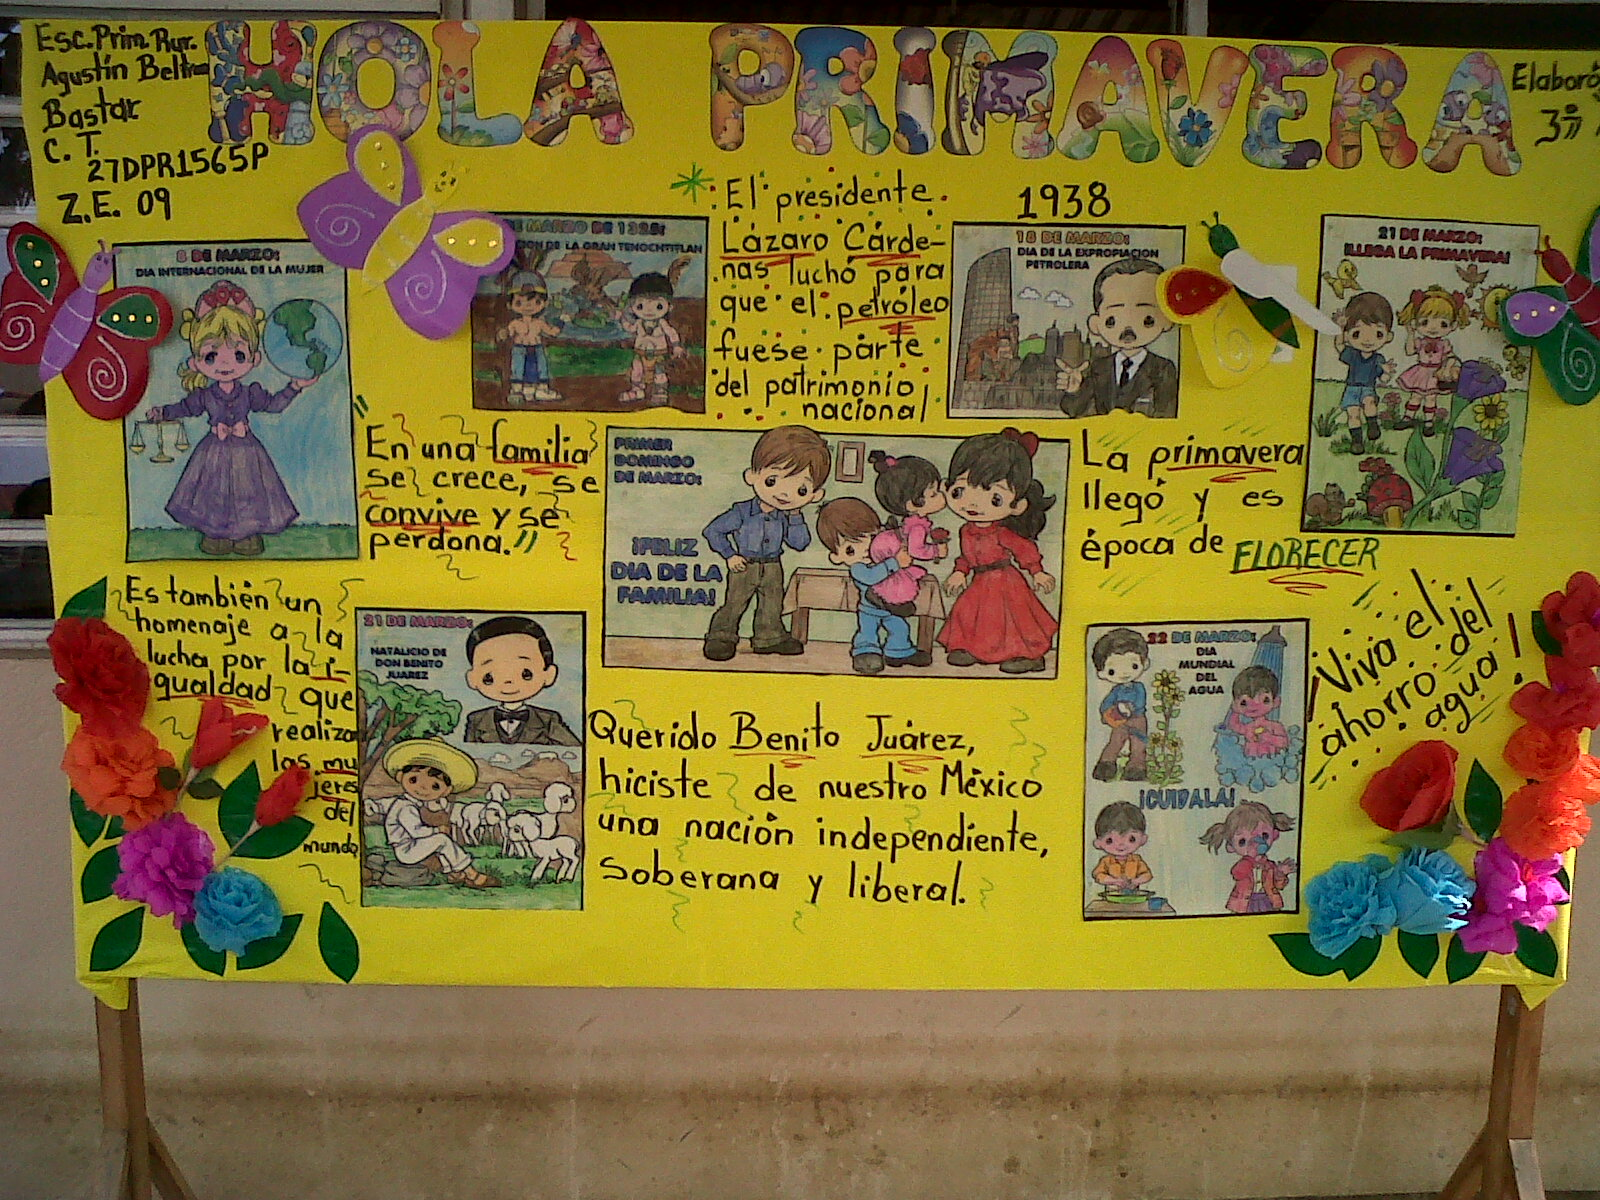 Periodico mural 6 imagenes educativas for Avisos de ocasion el mural